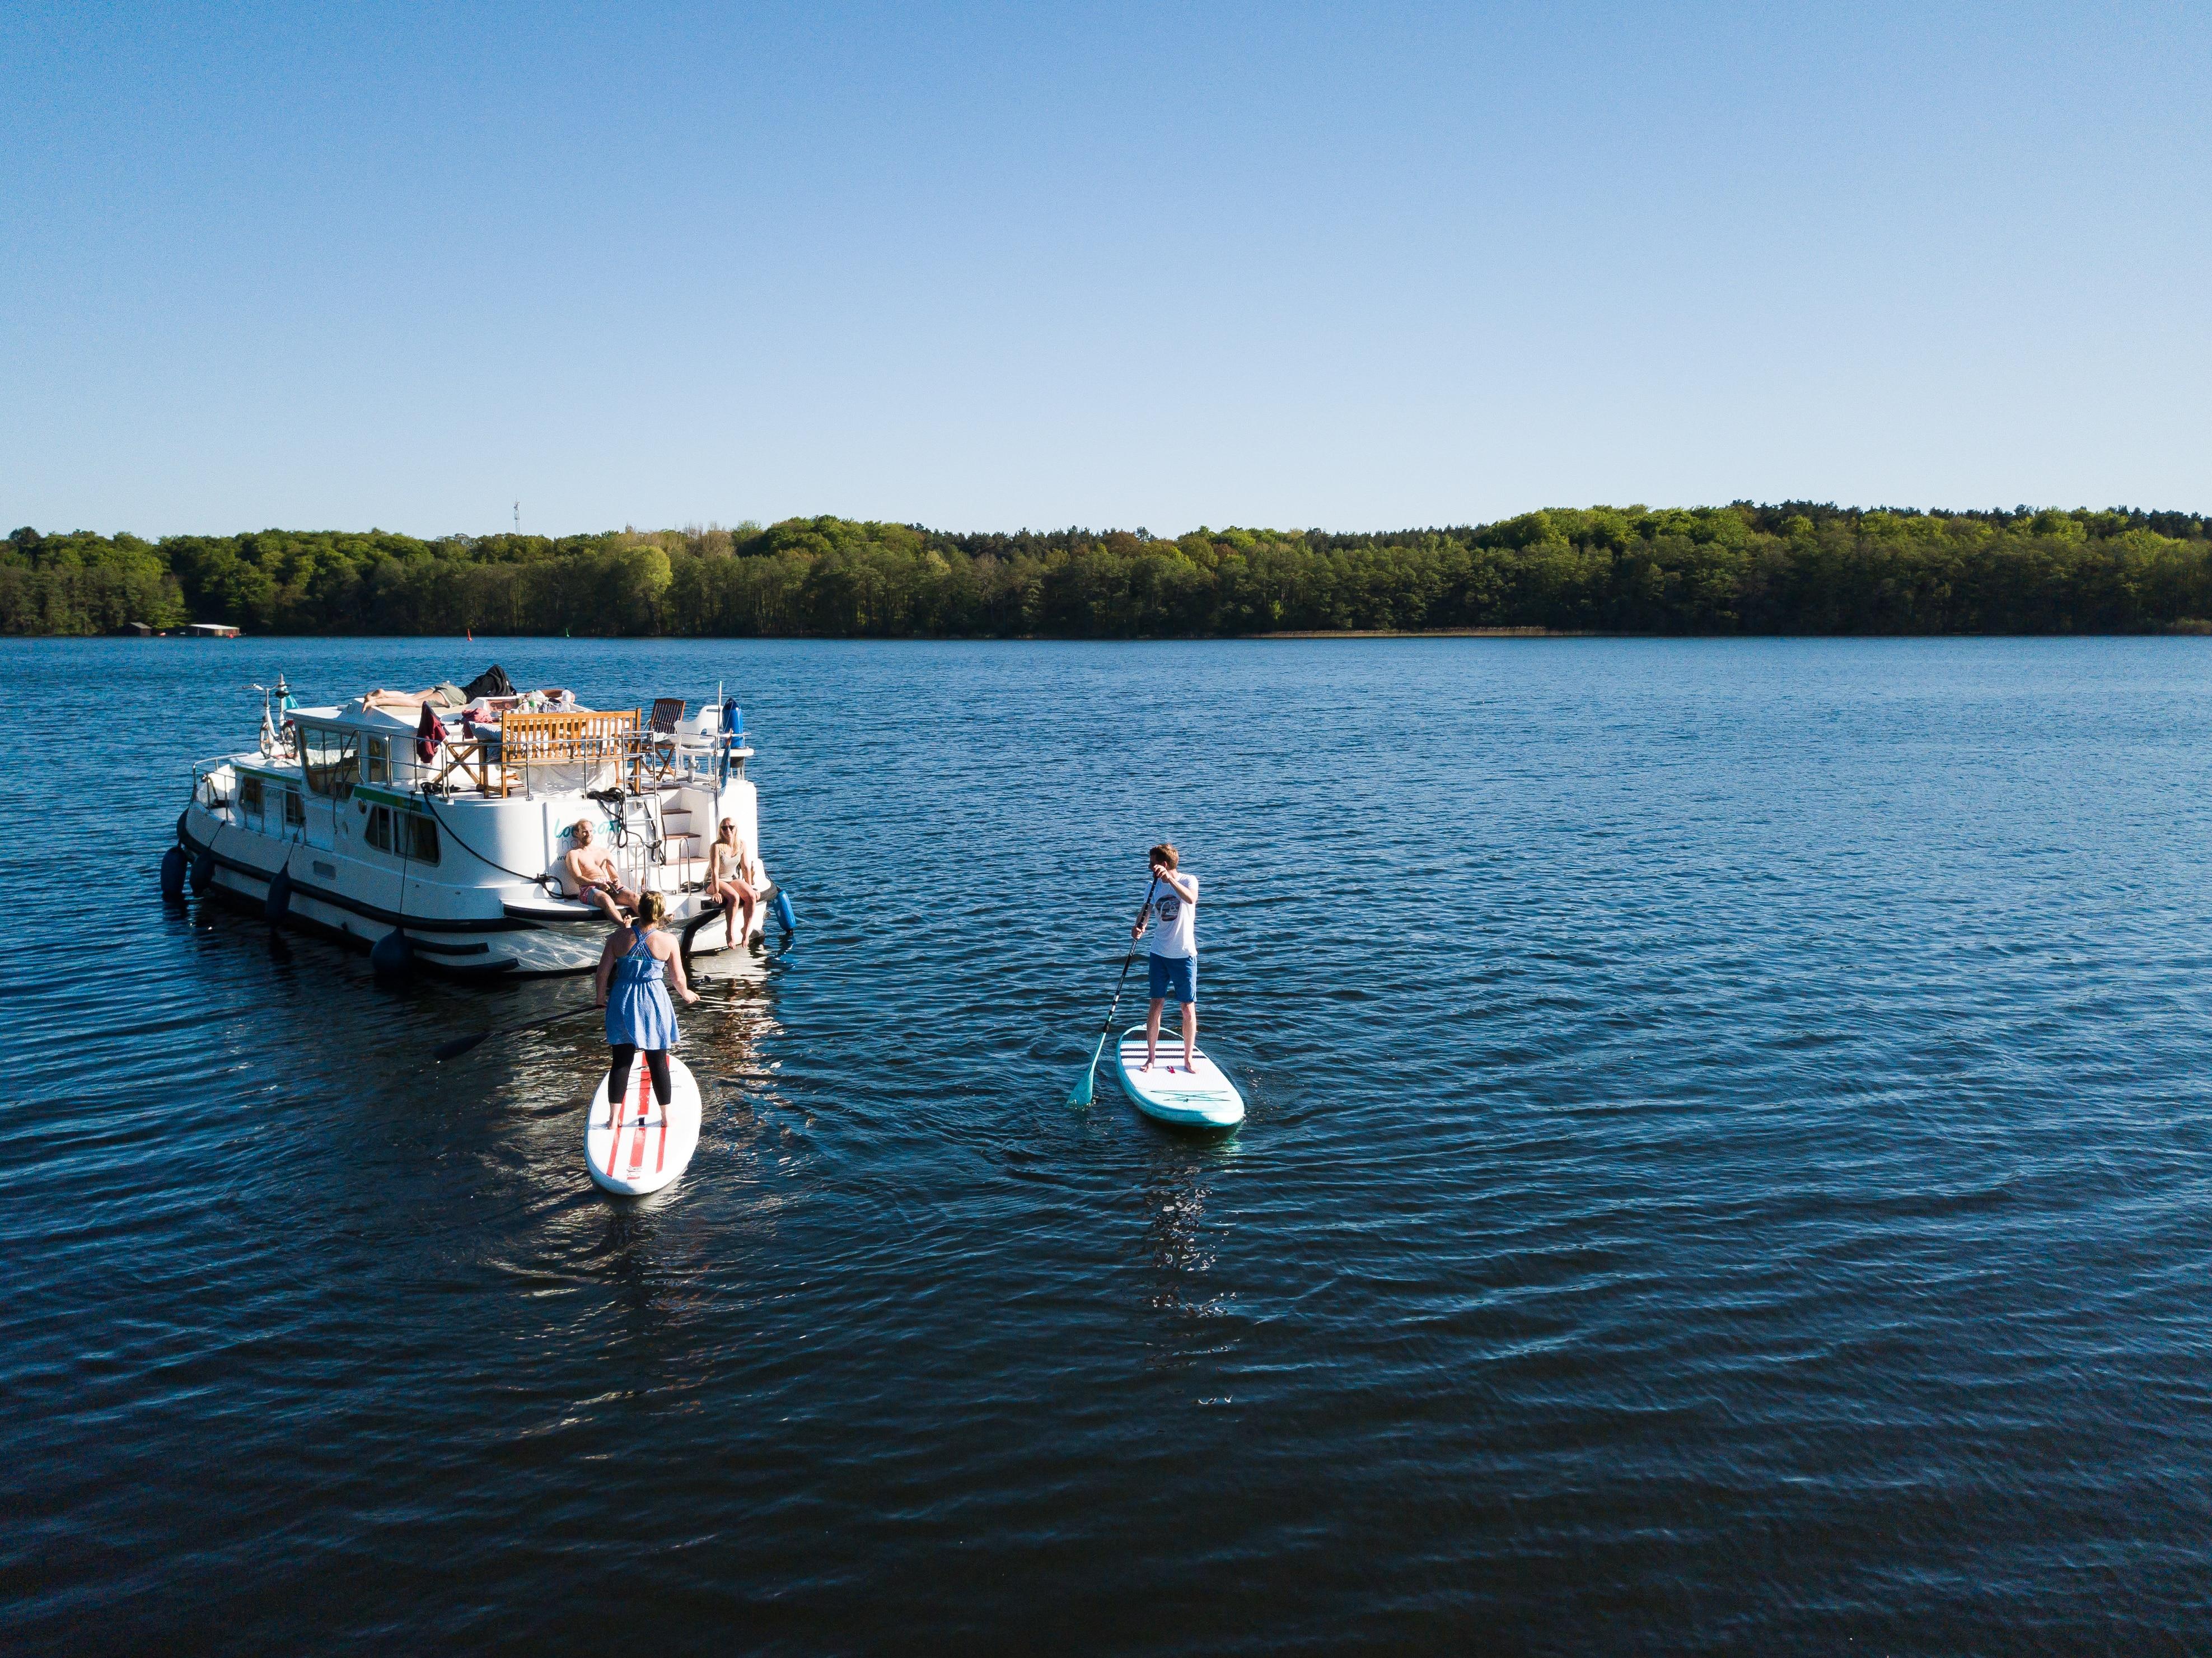 Mecklenburg-hausboot-mieten-8-personen-paddle.jpg